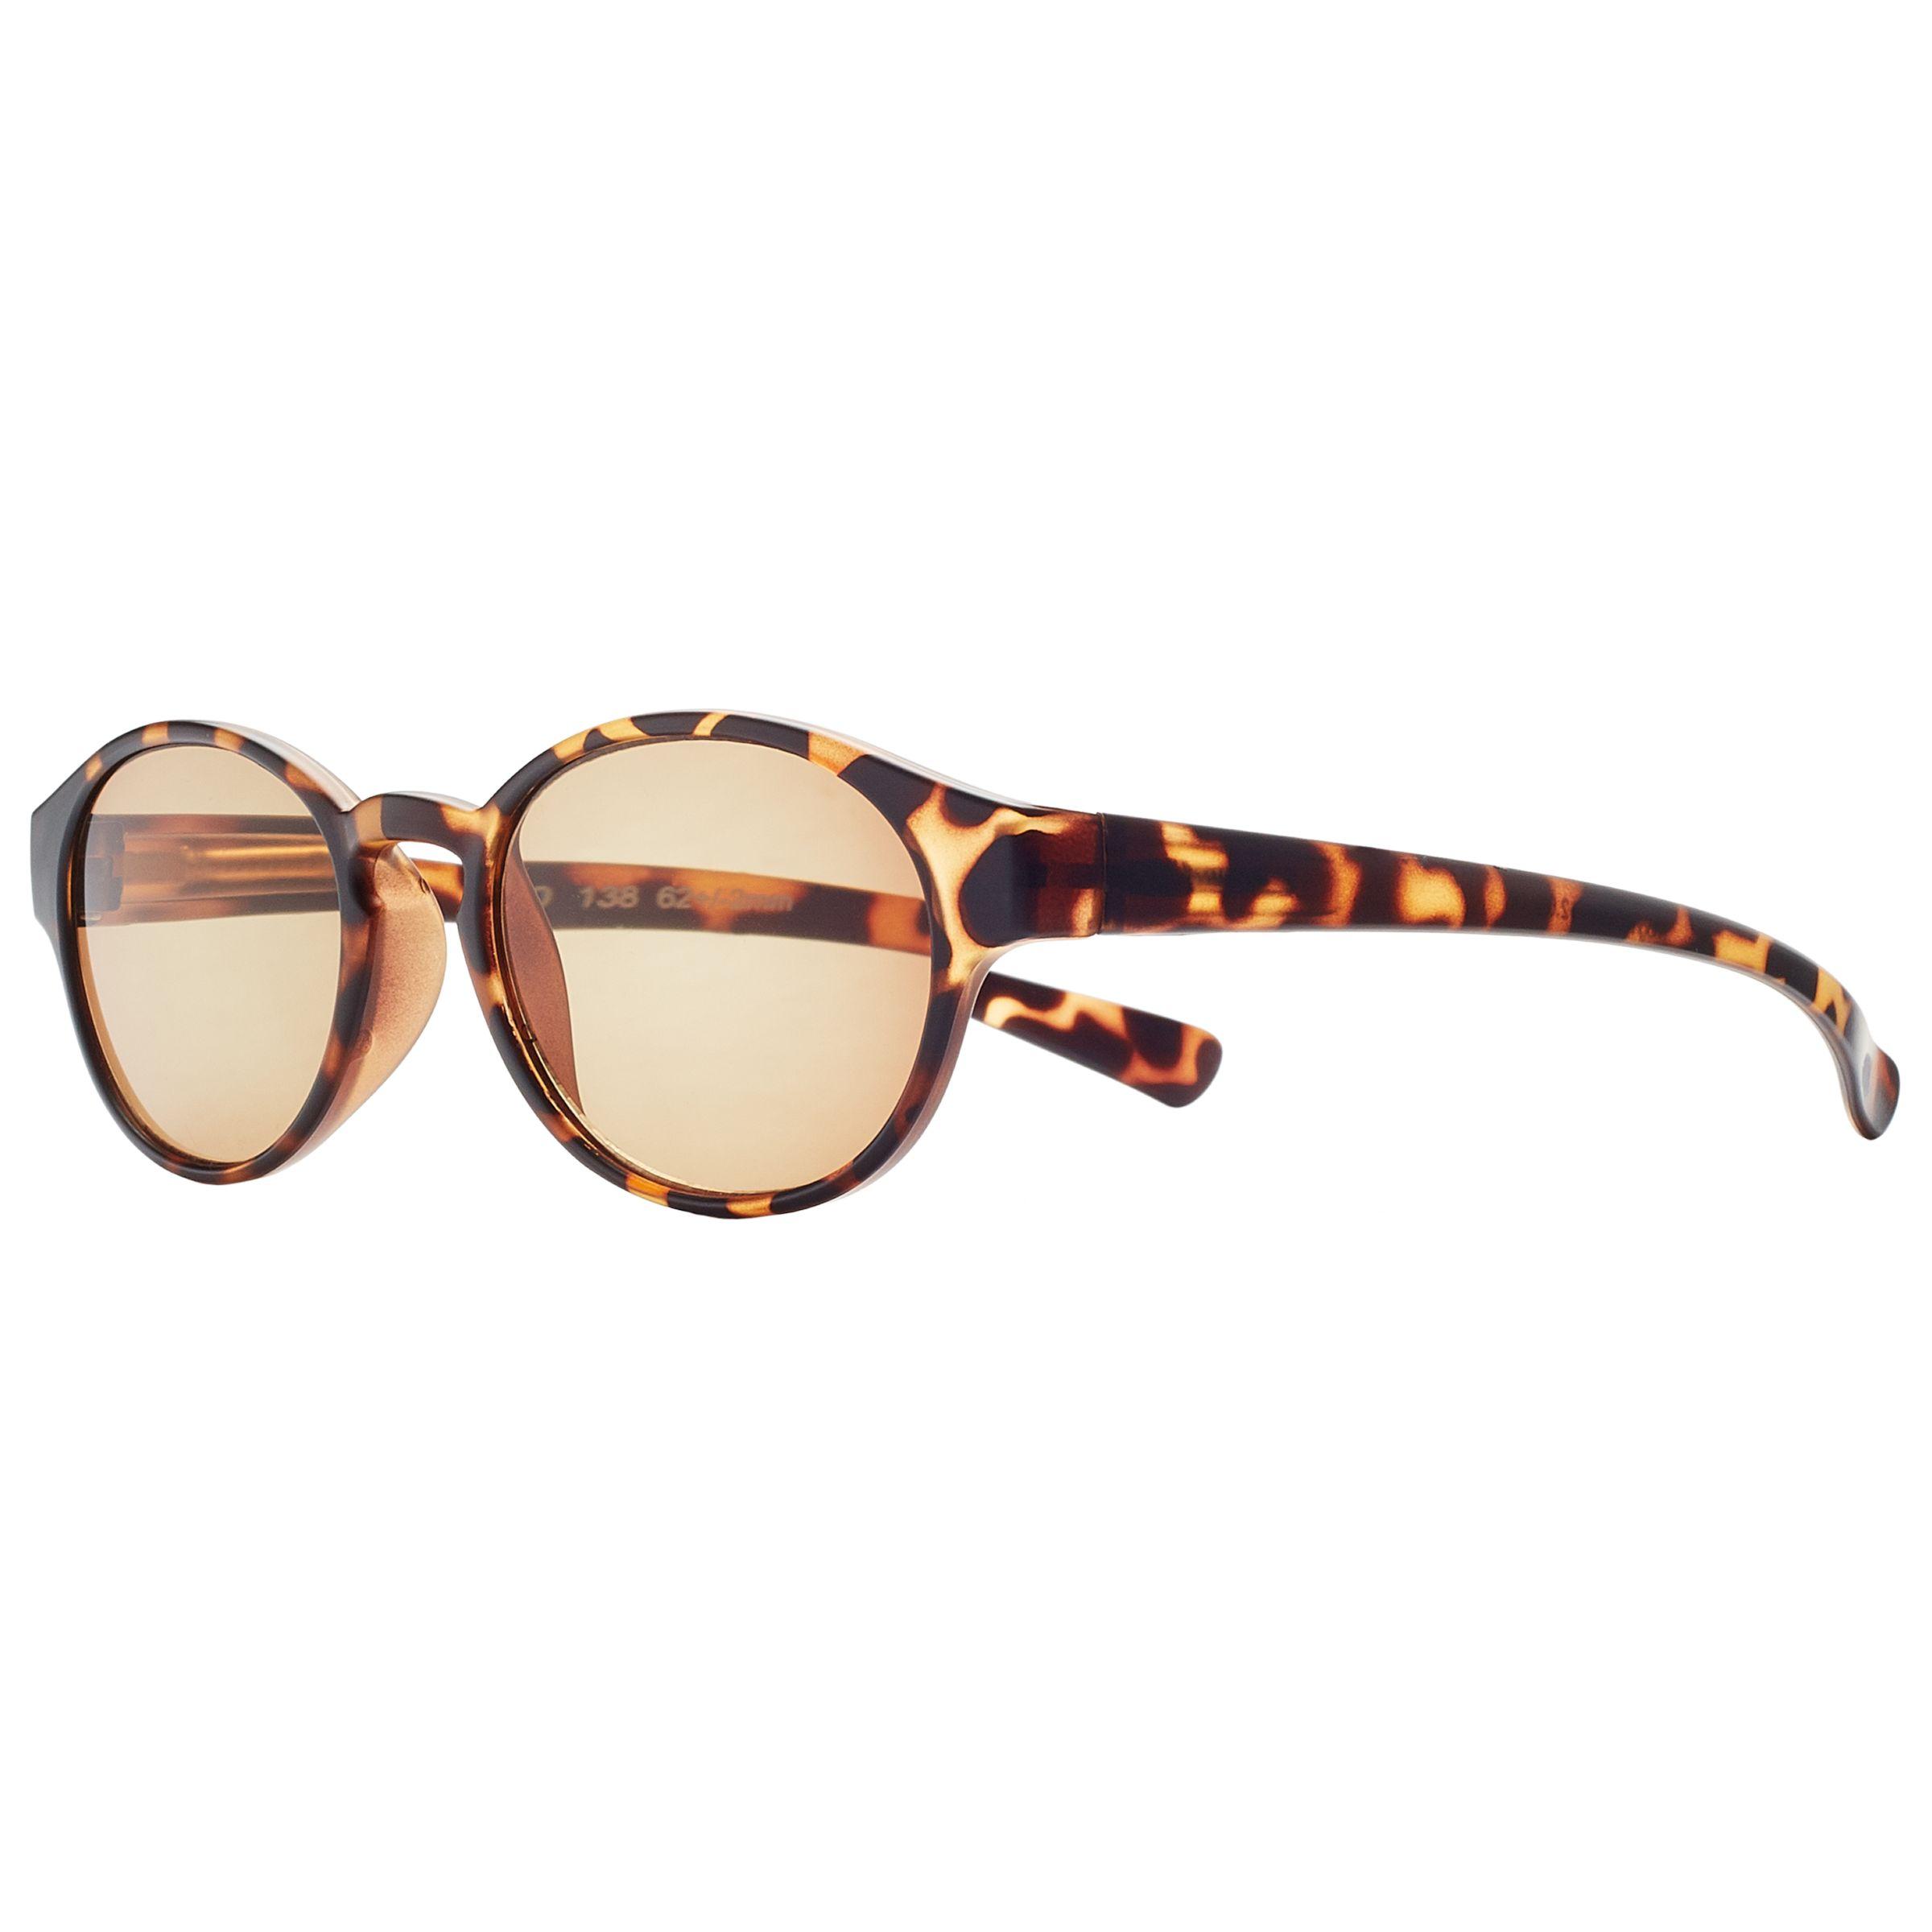 Magnif Eyes Magnif Eyes Ready Readers Malibu Glasses, Tortoise